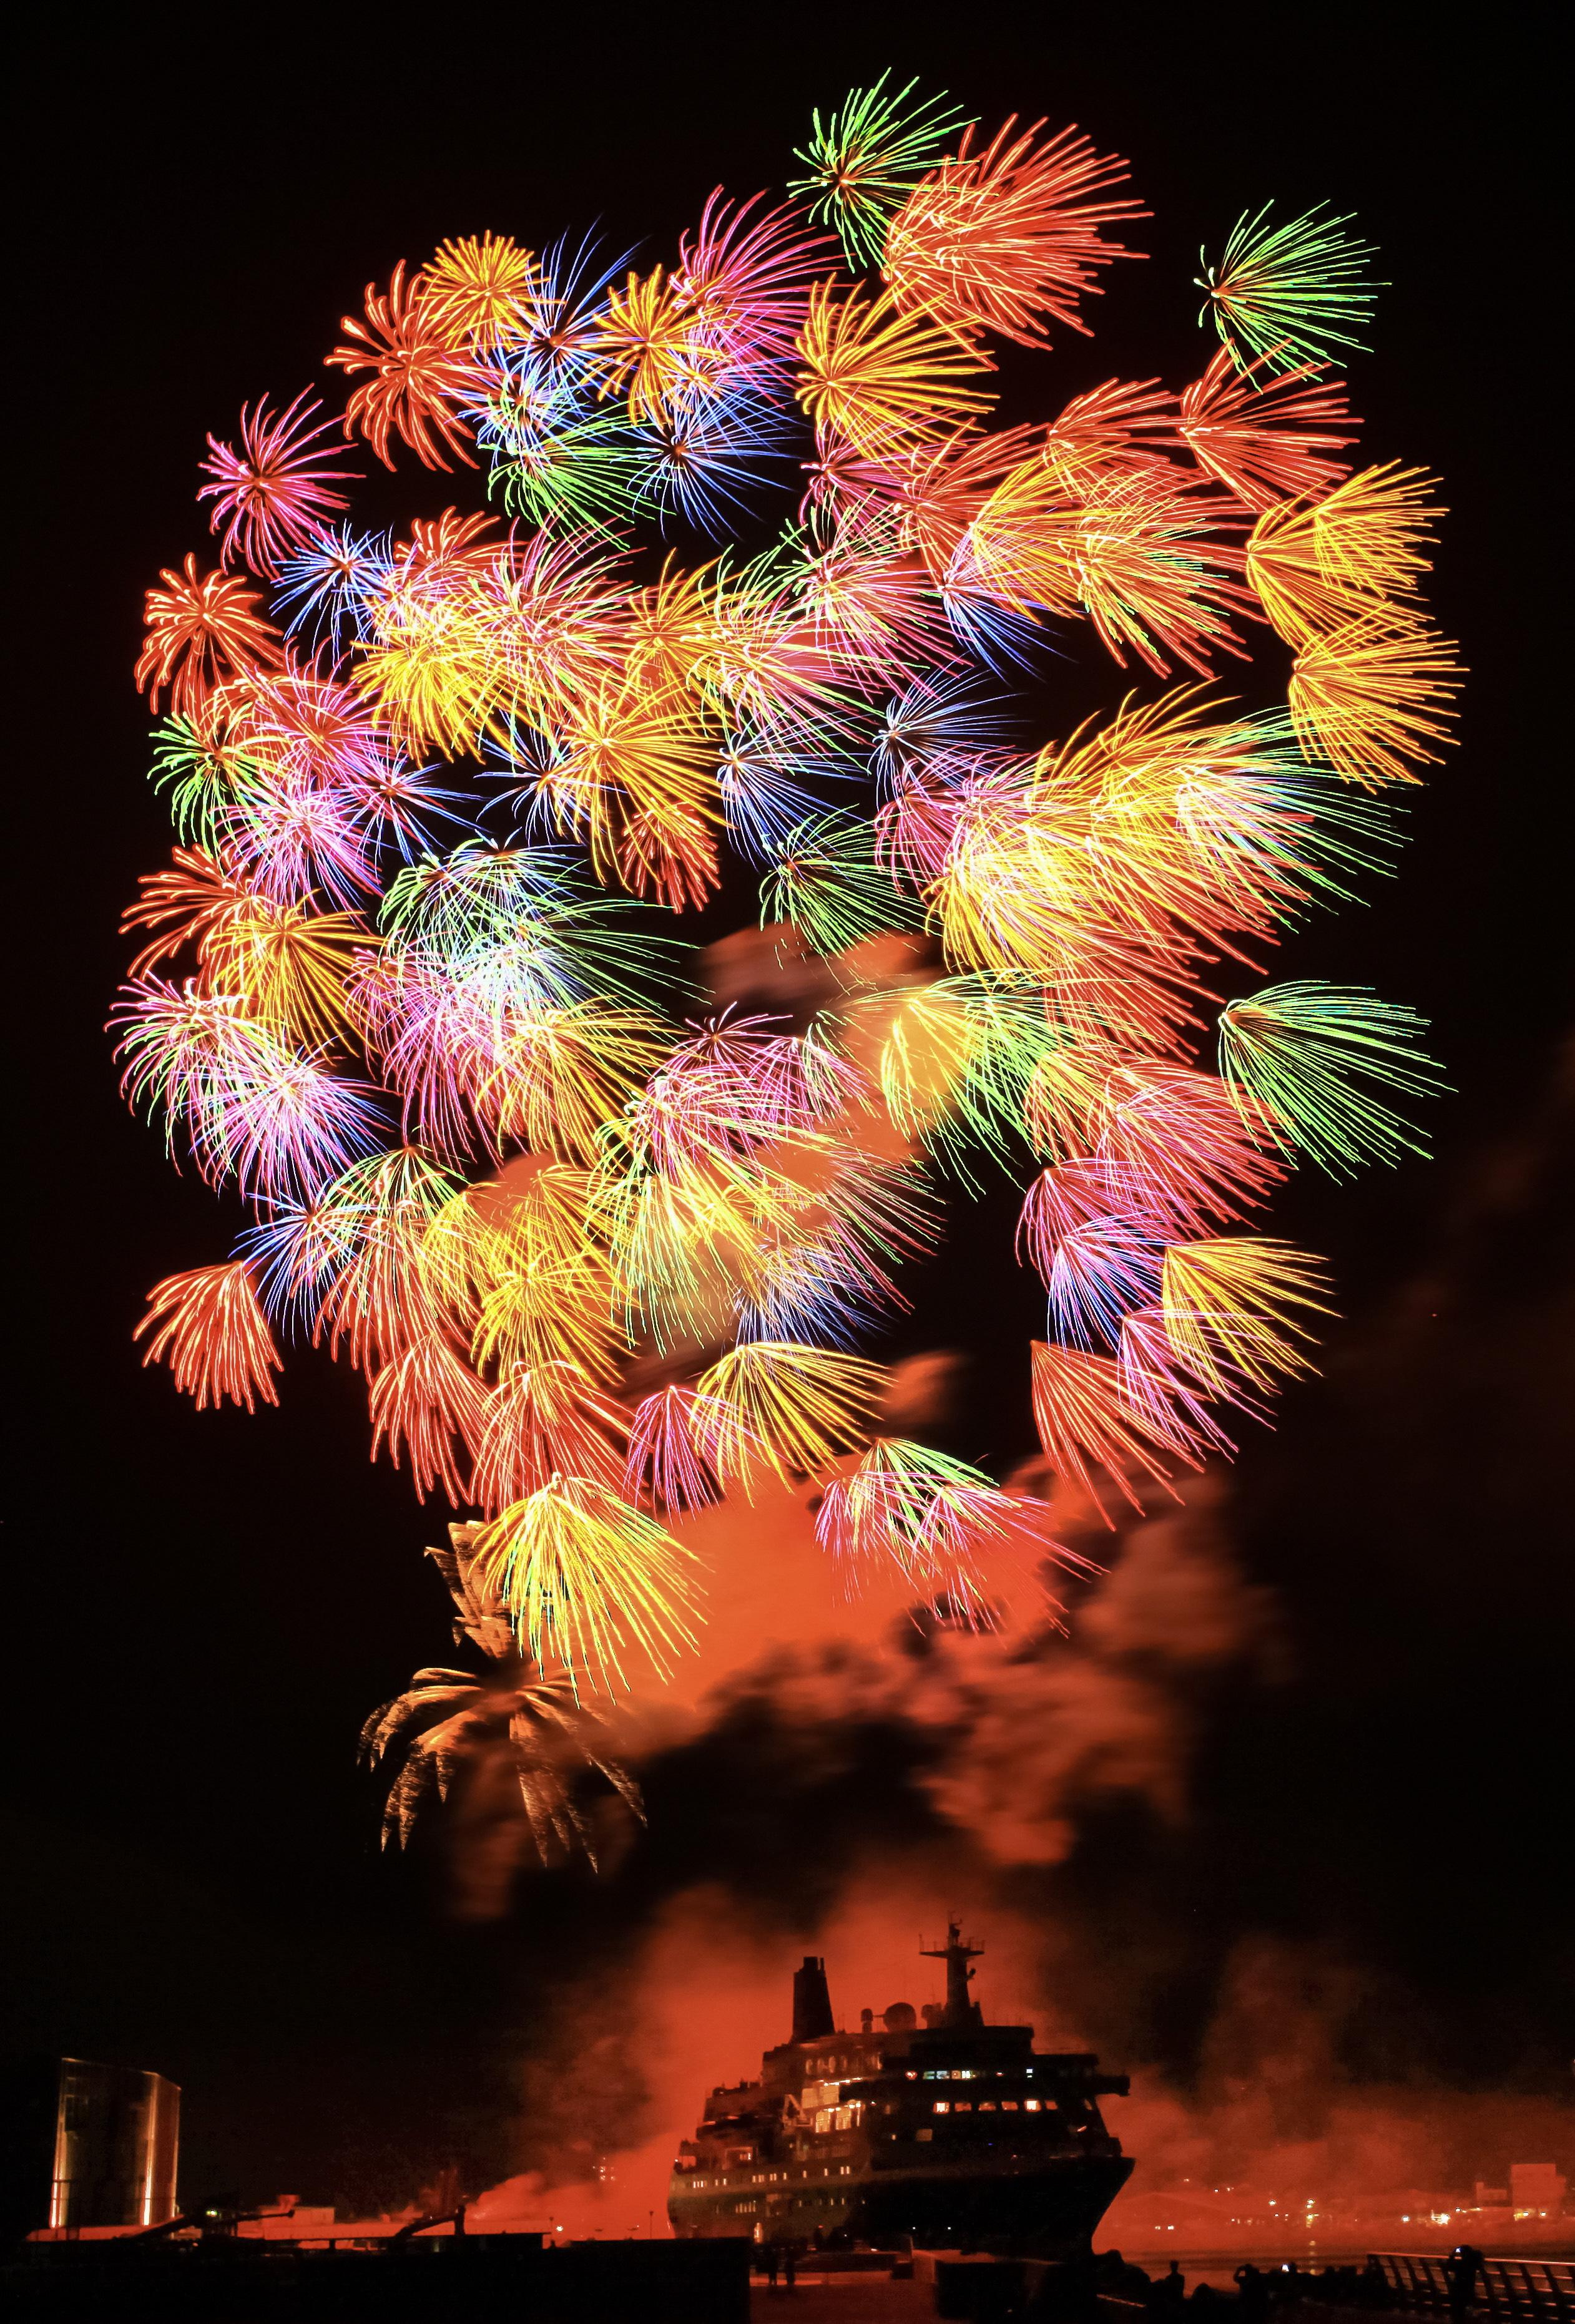 Wajima Community Fireworks Festival